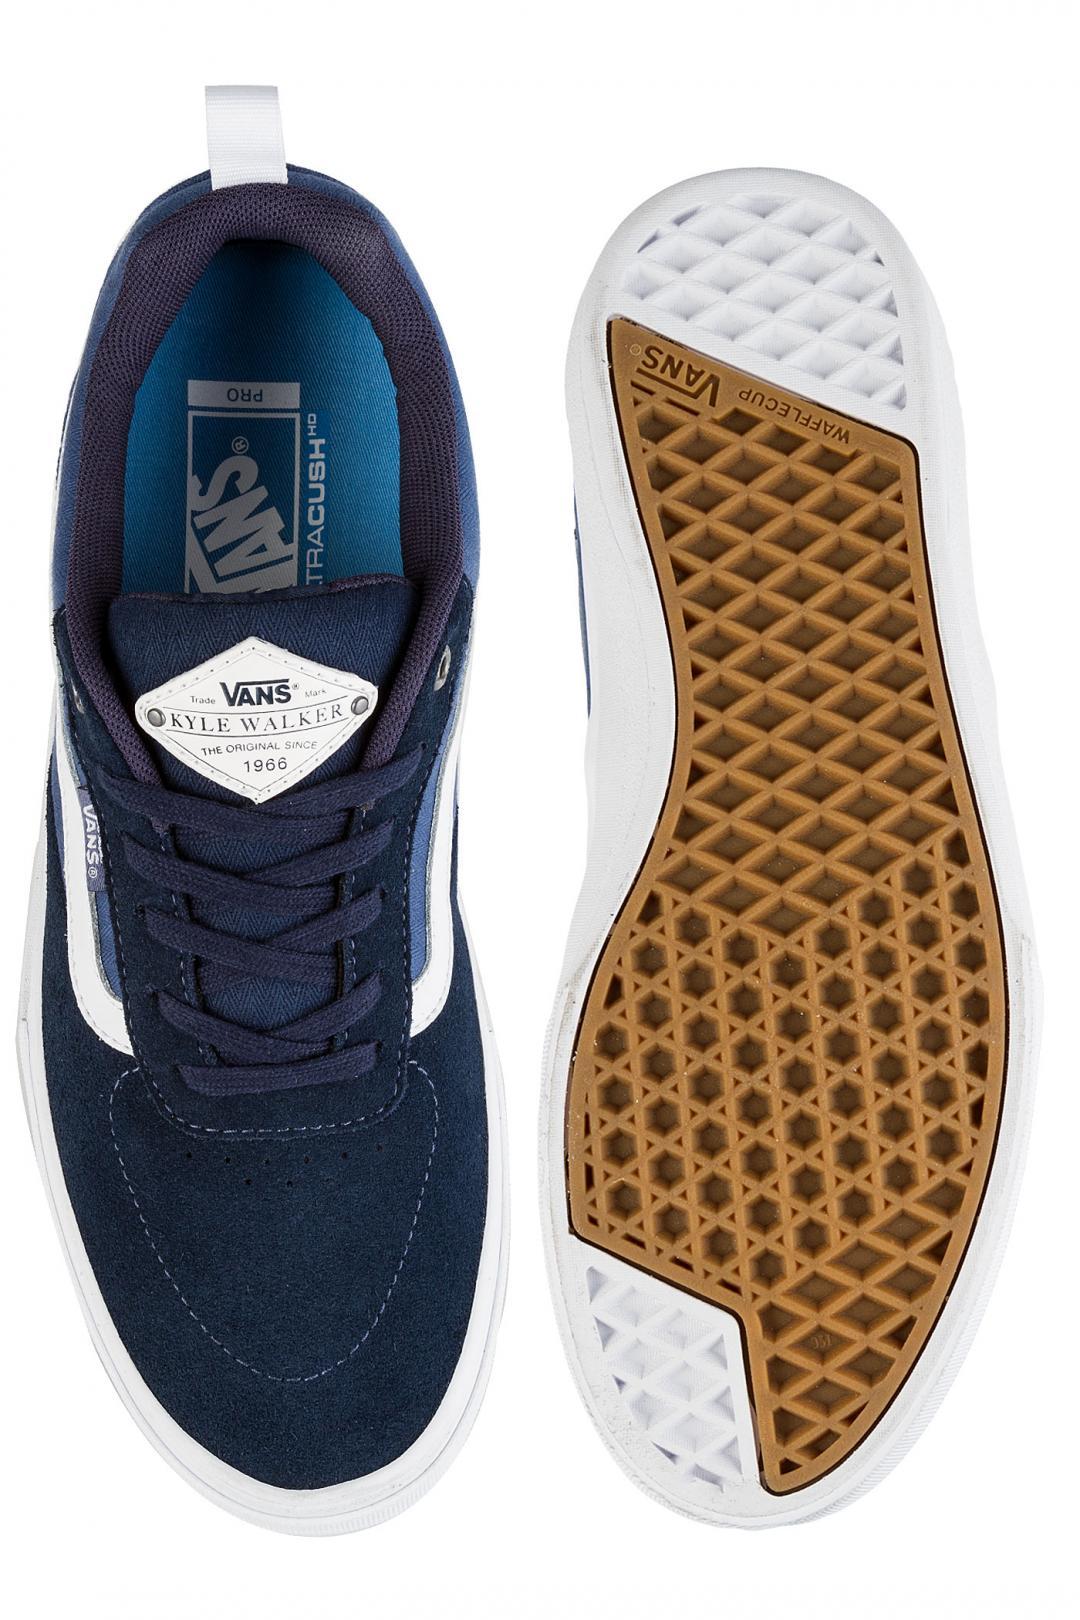 Uomo Vans Kyle Walker Pro dress blues vintage indigo white | Scarpe da skate